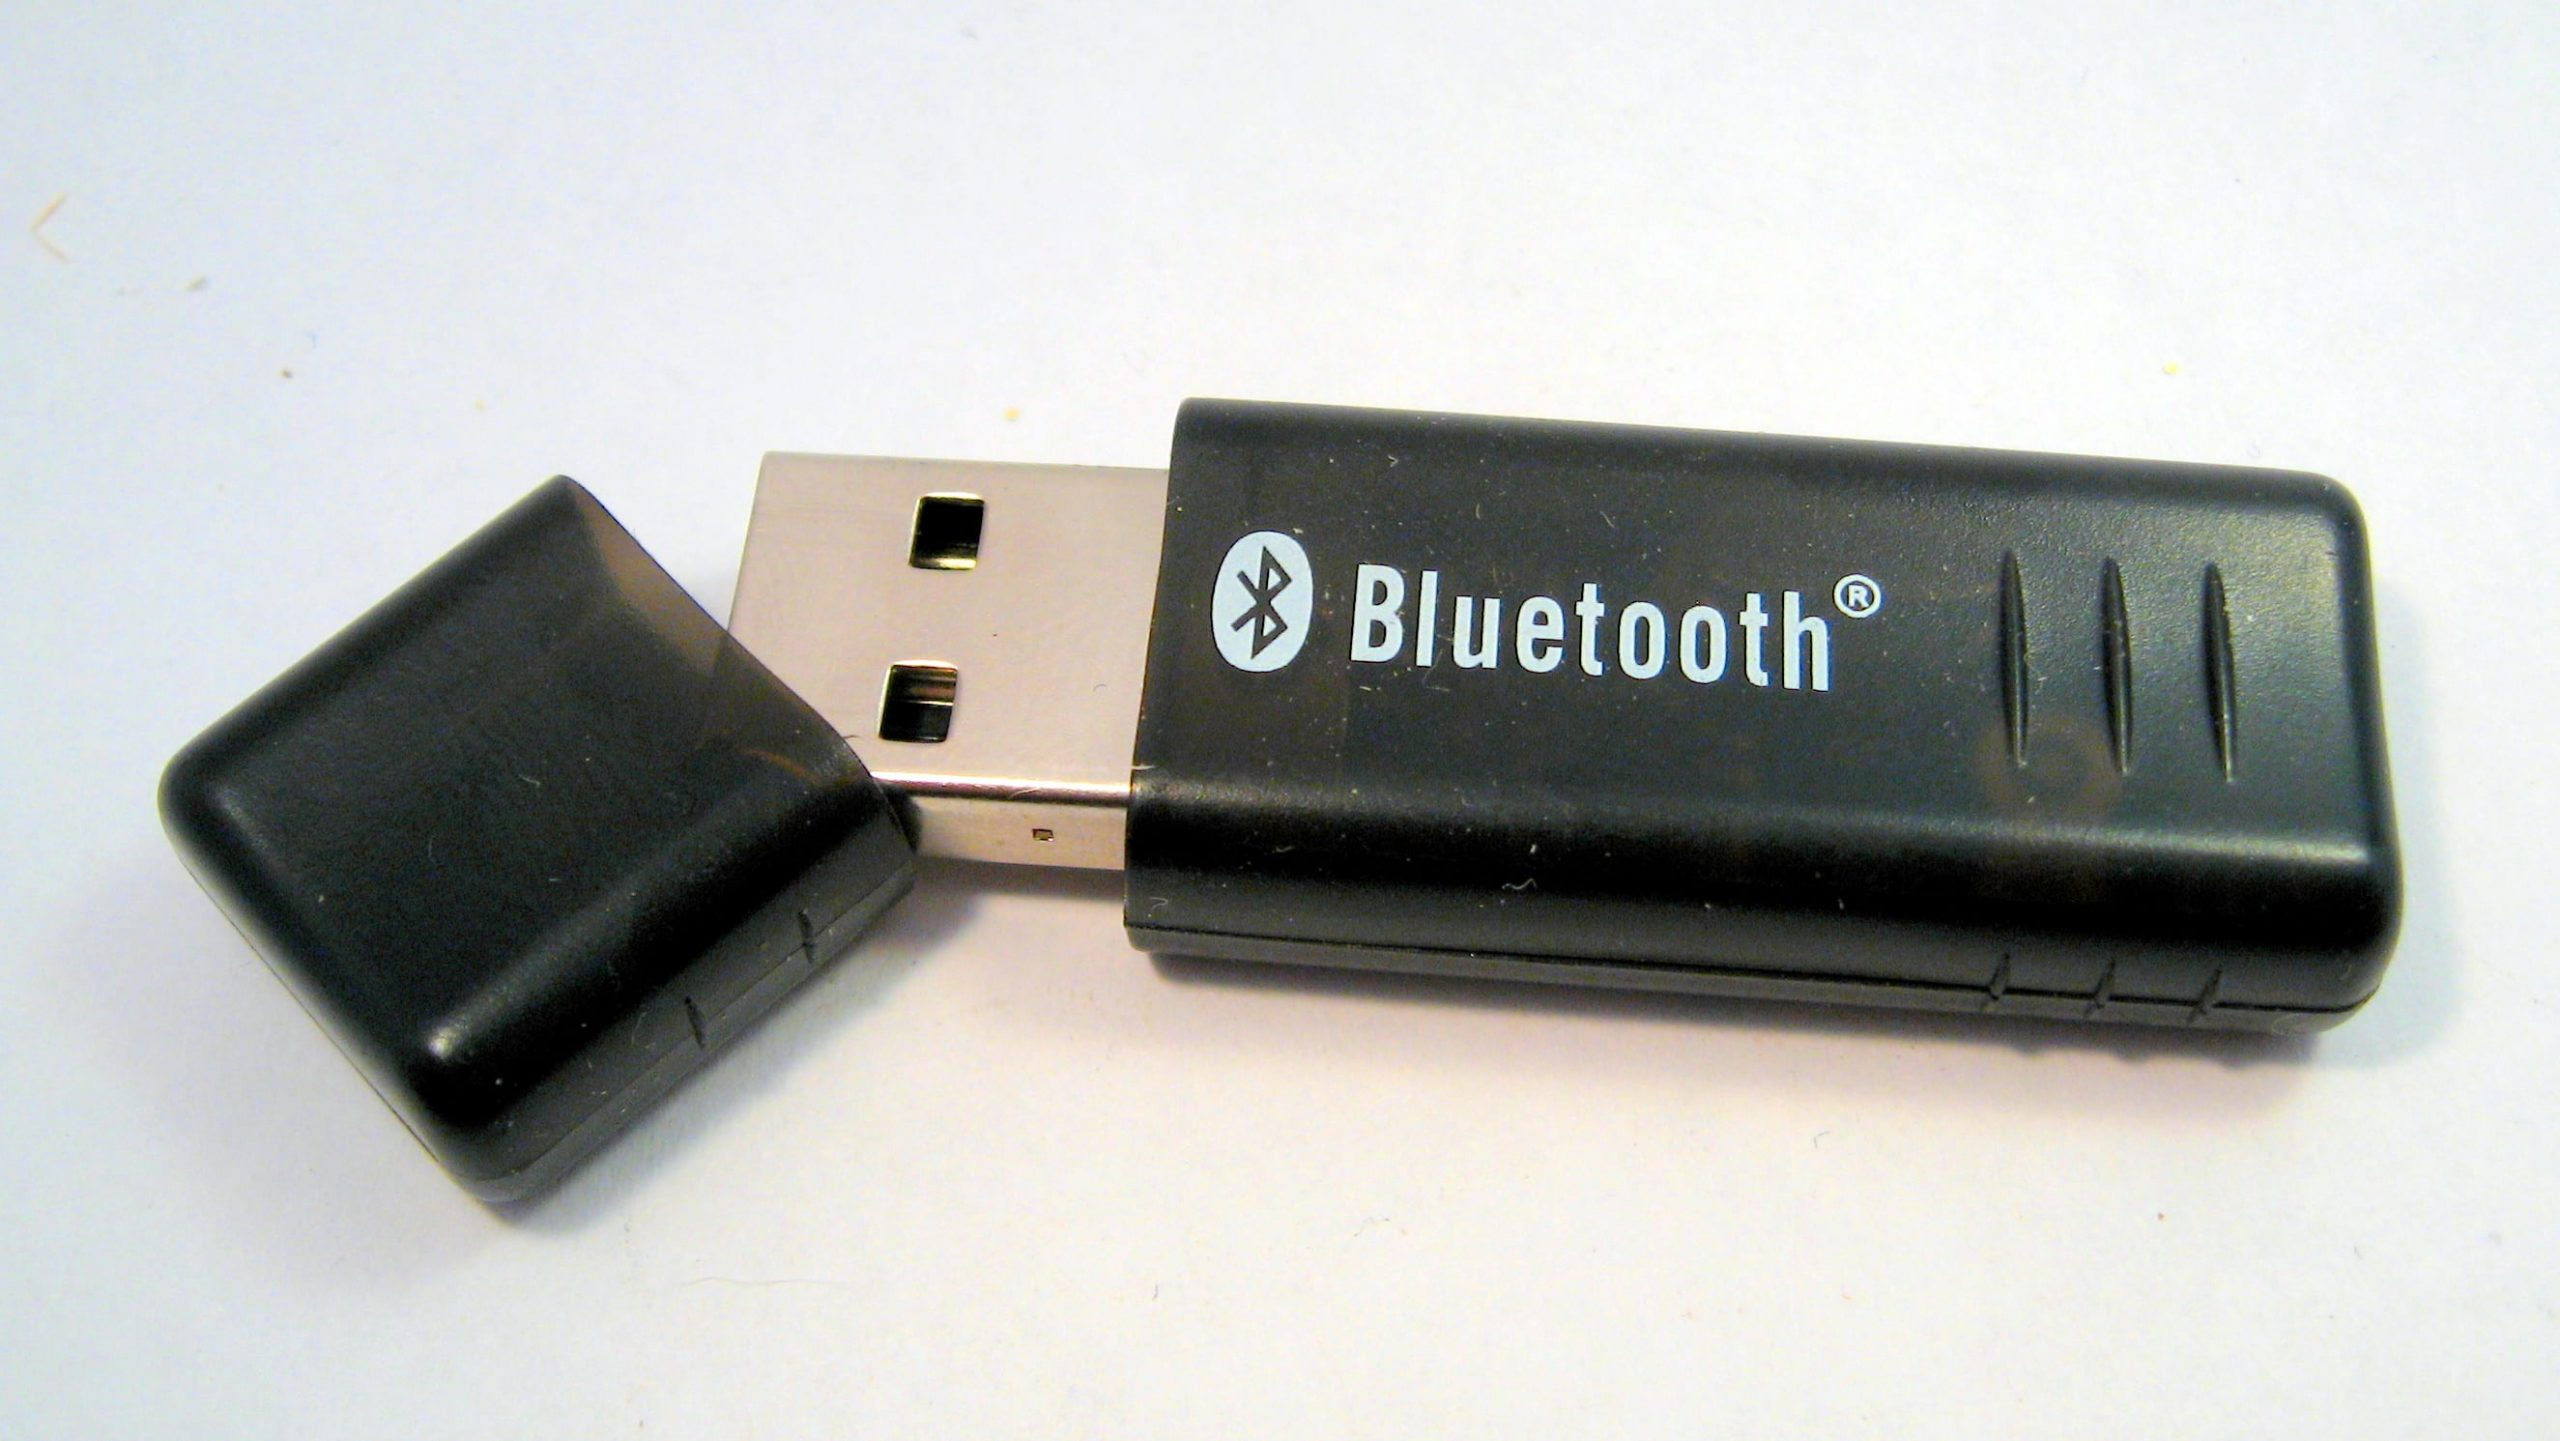 Solucionar problema para emparejar un dispositivo Bluetooth